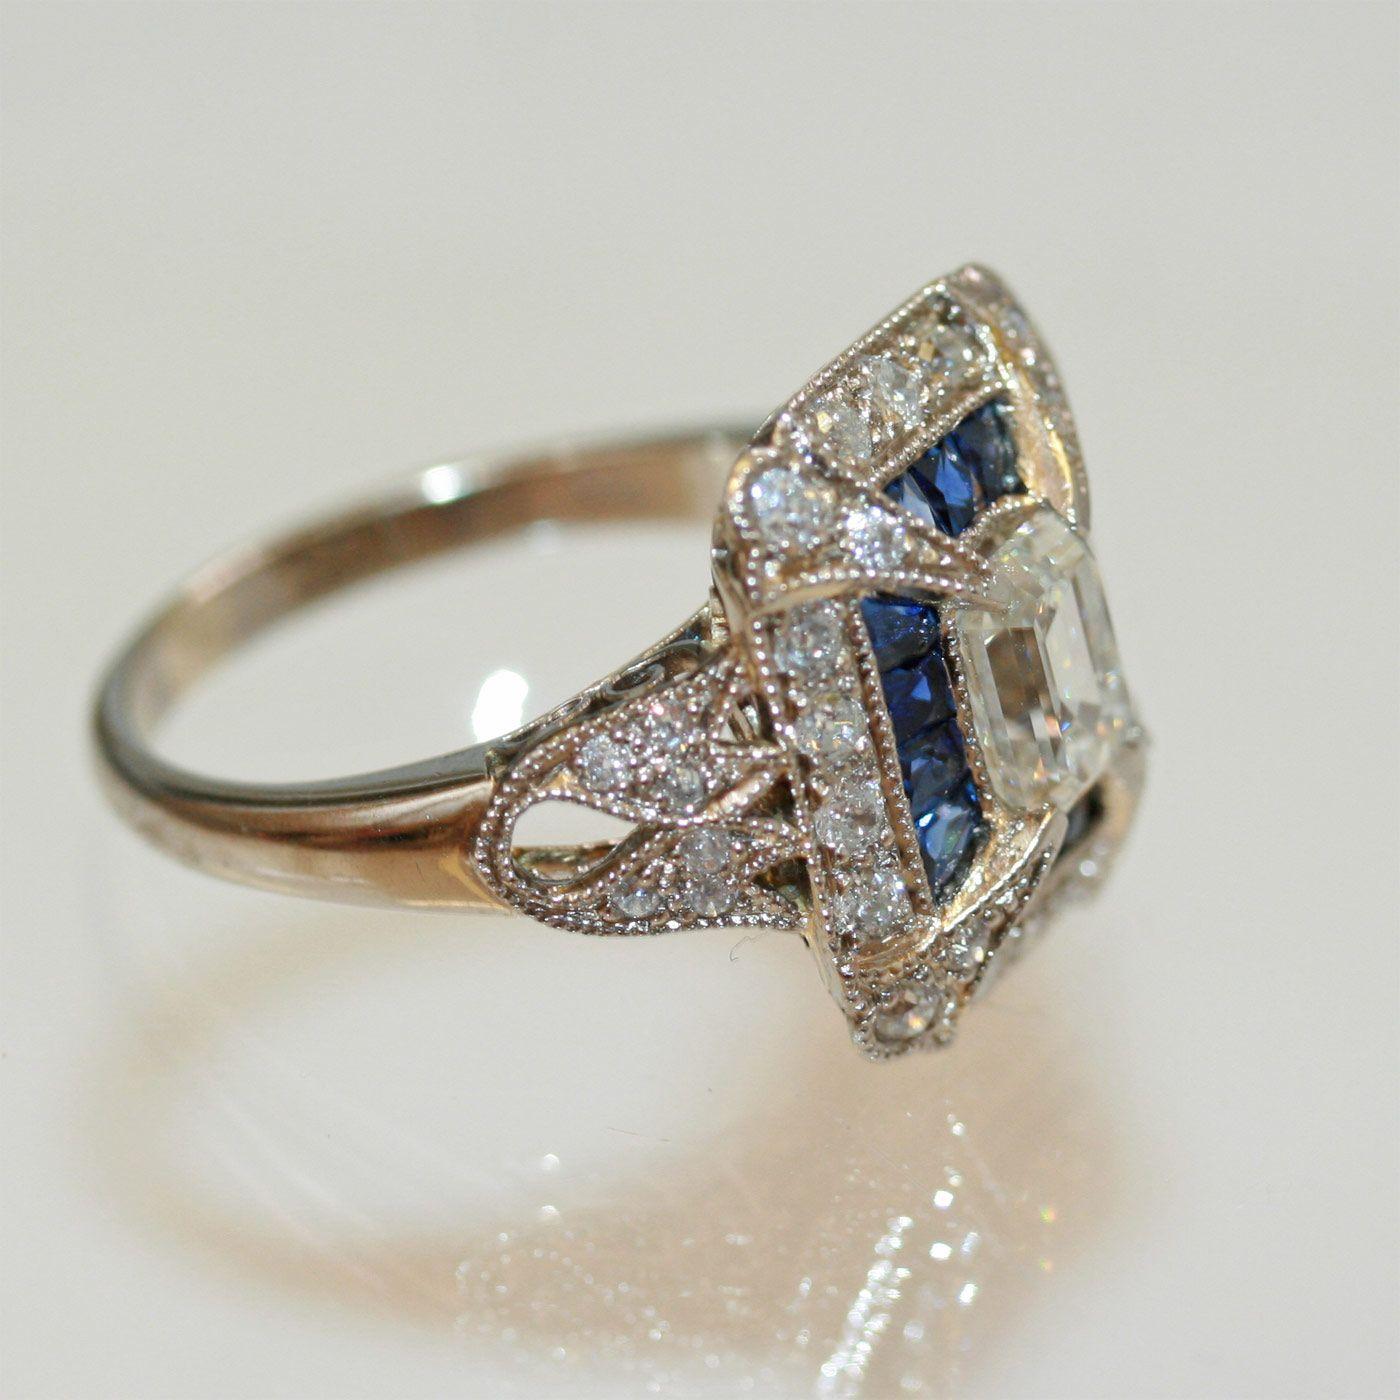 antique rings 1800's | Buy Antique sapphire ring, Sold Rings Sydney - KalmarAntiques